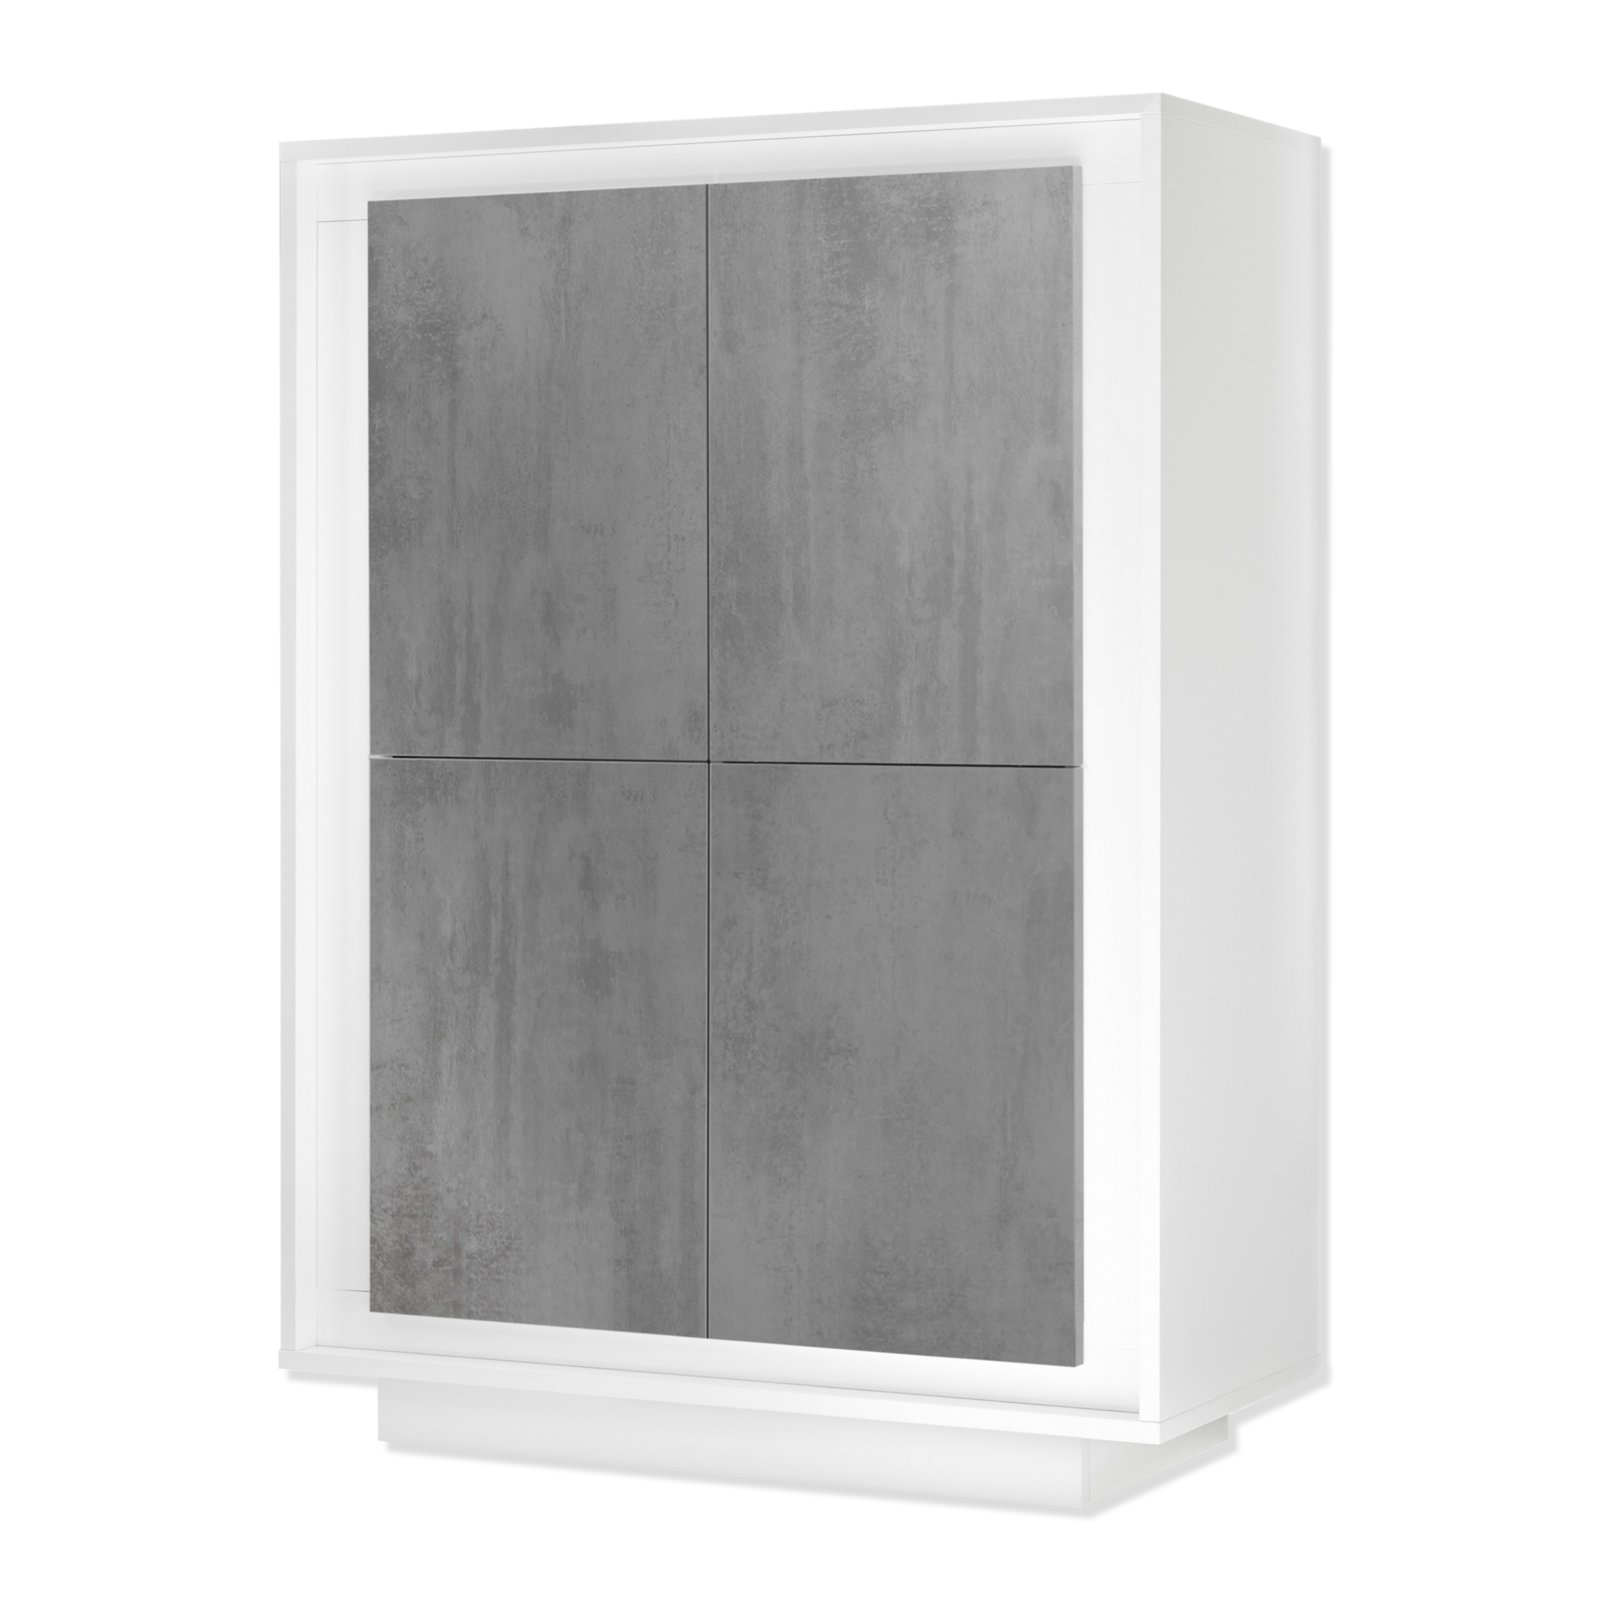 highboard loft wei matt beton optik 106x146 cm kommoden sideboards m bel roller. Black Bedroom Furniture Sets. Home Design Ideas